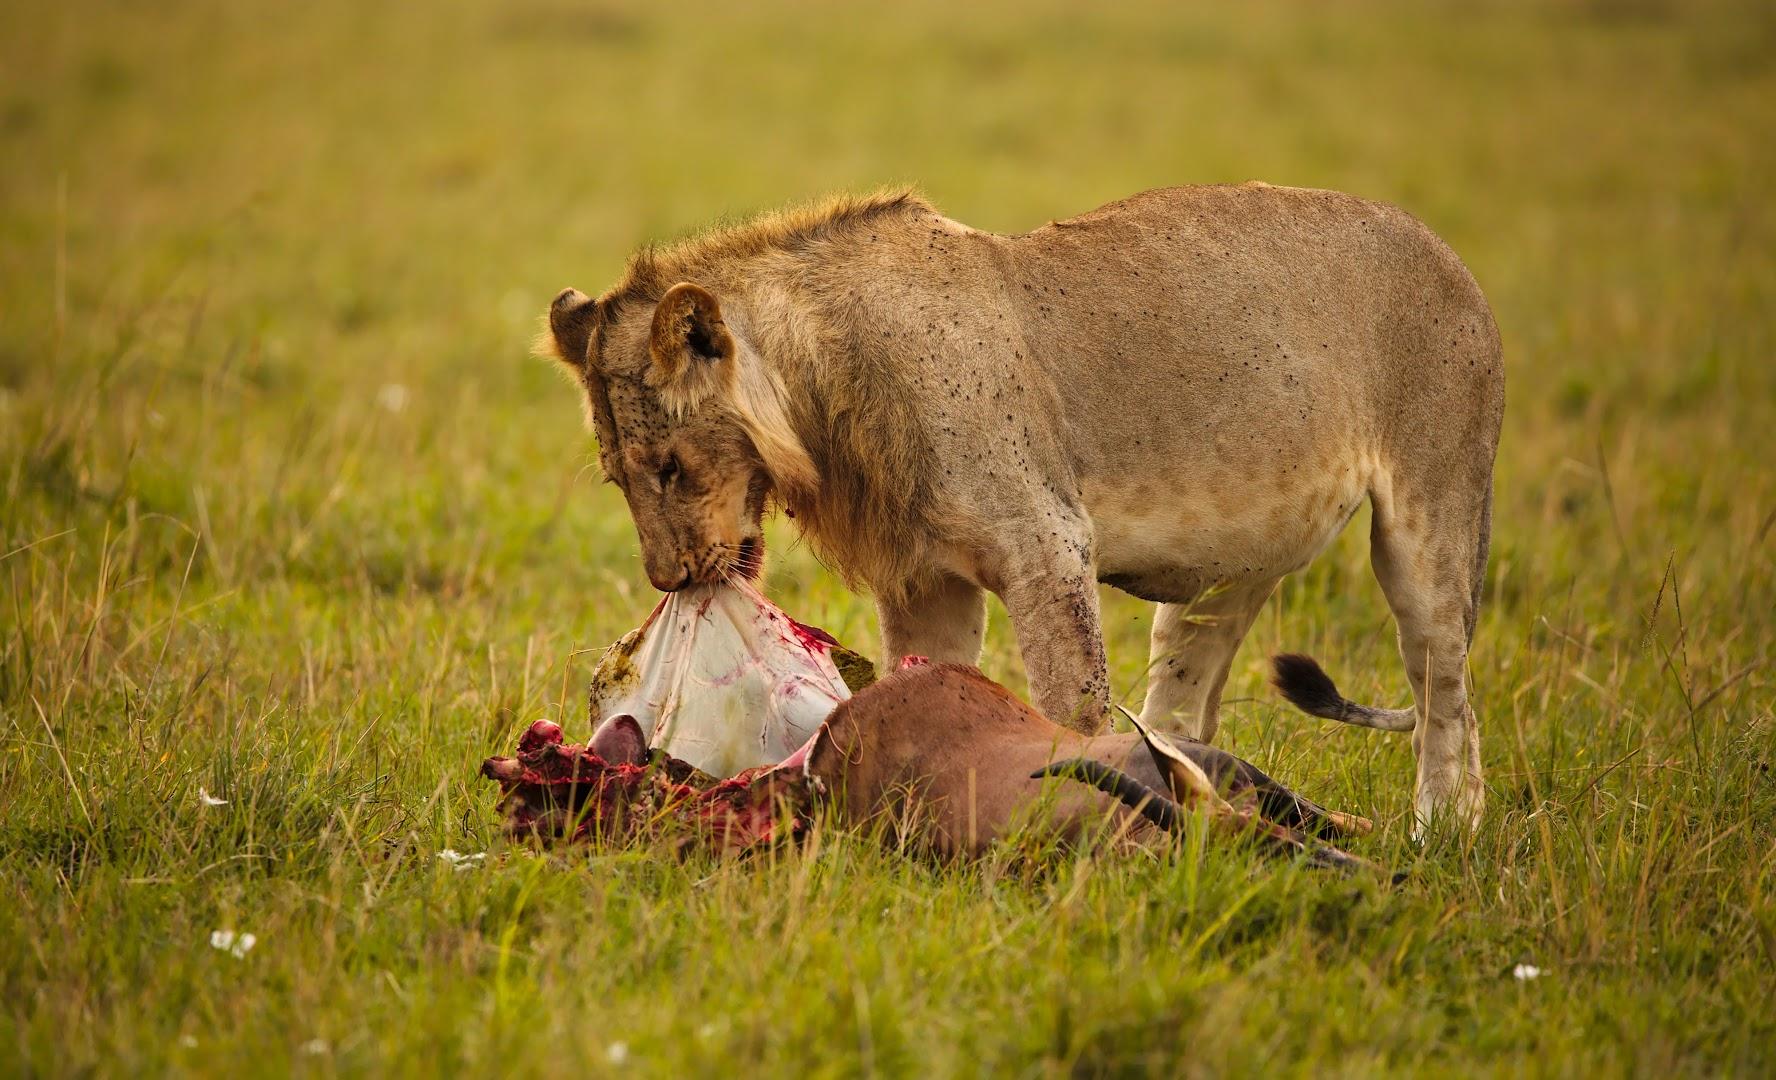 While animal kingdom is waking up...